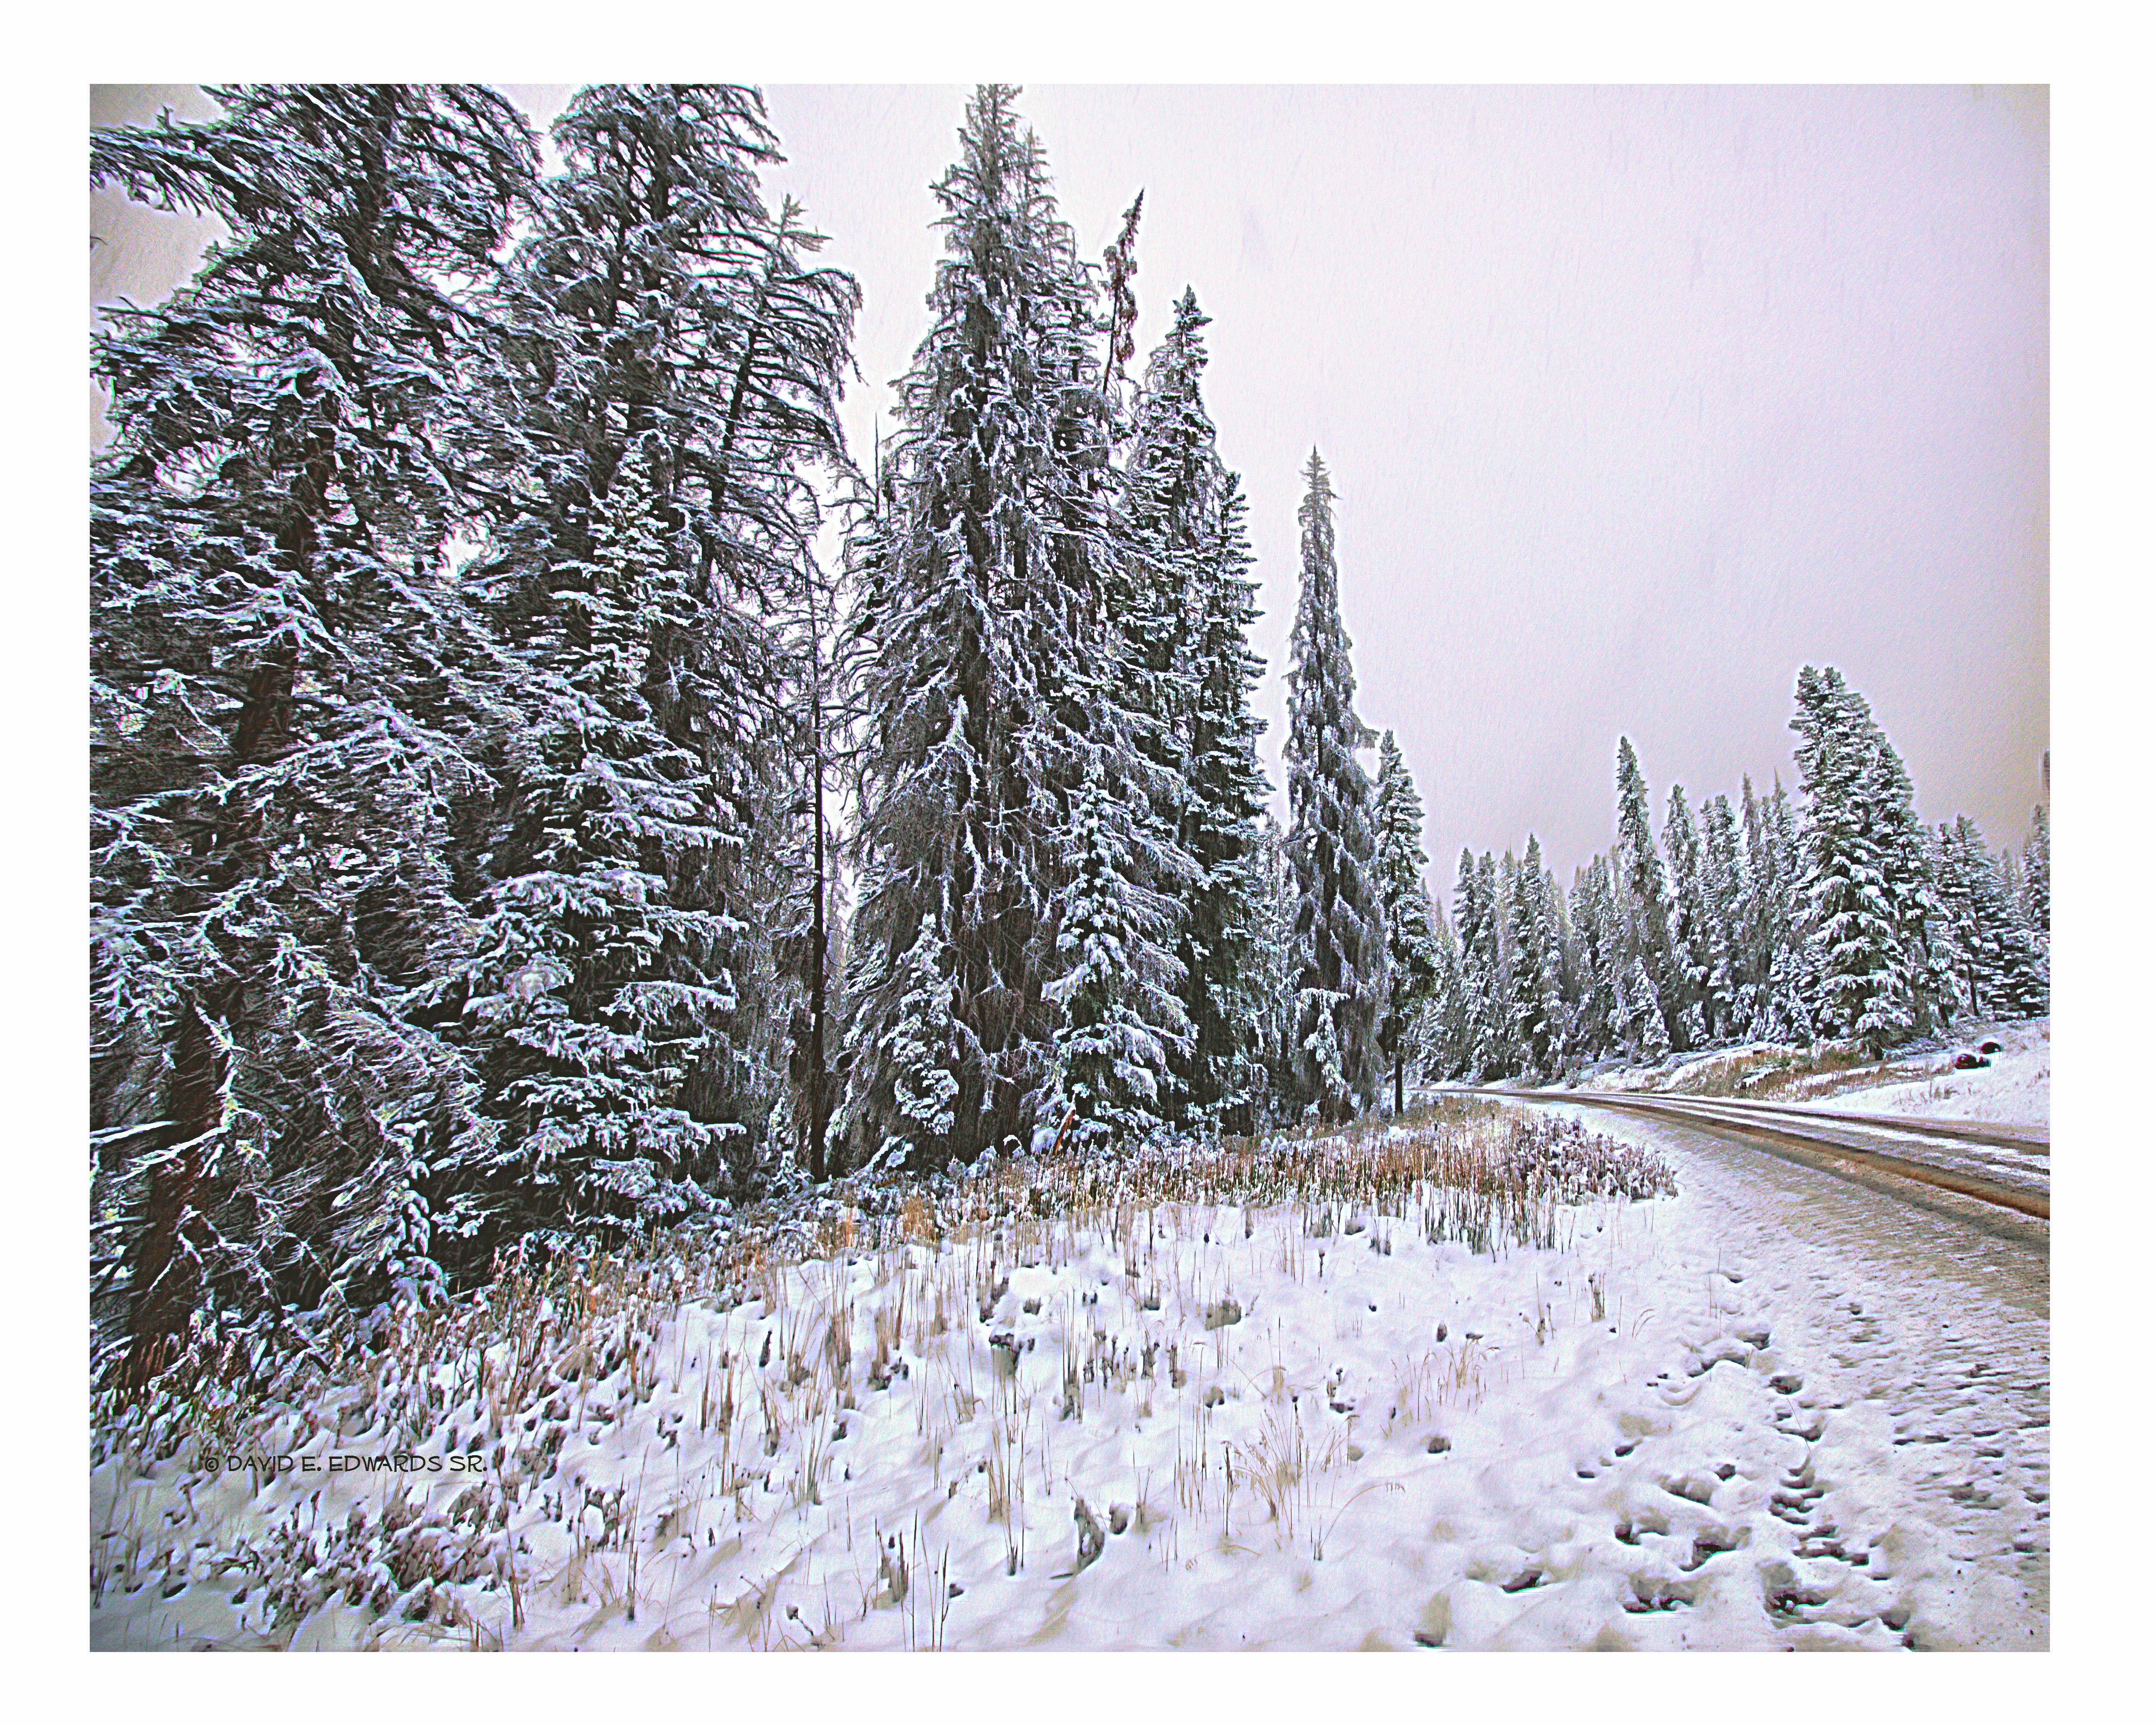 Back road near Grand Teton